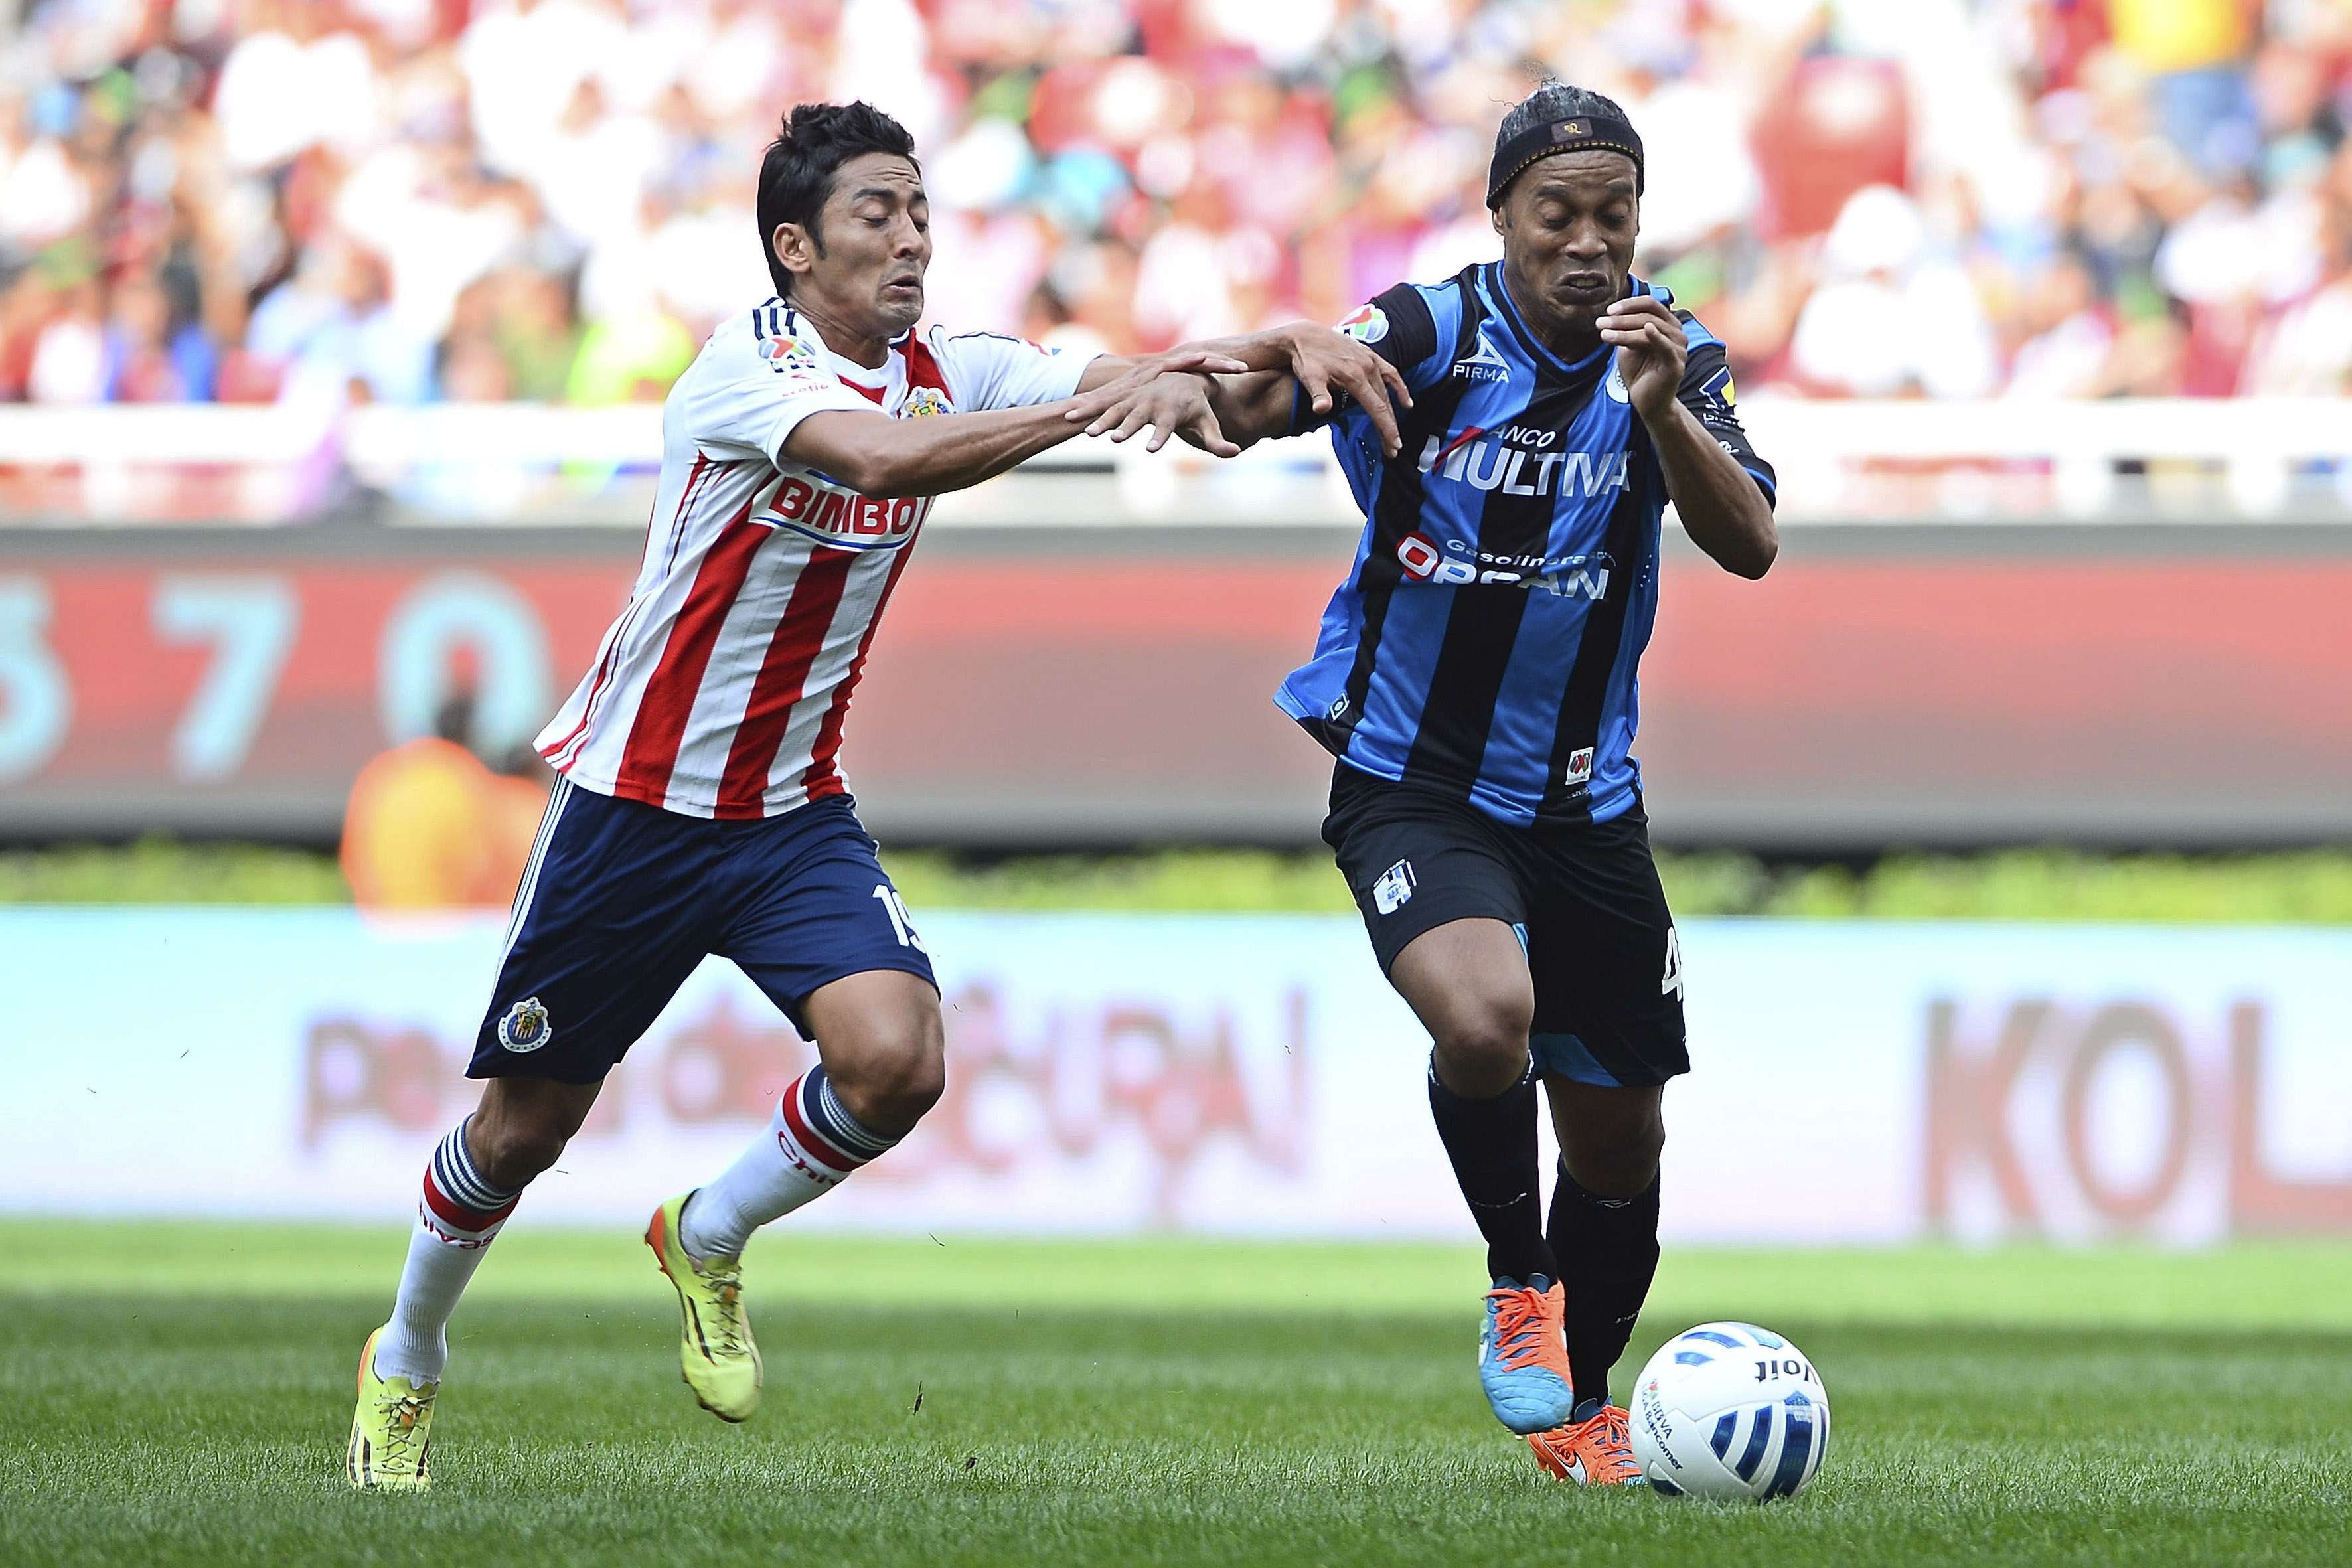 Ronaldinho quiere marcar otra vez ante Chivas. Foto: Mexsport